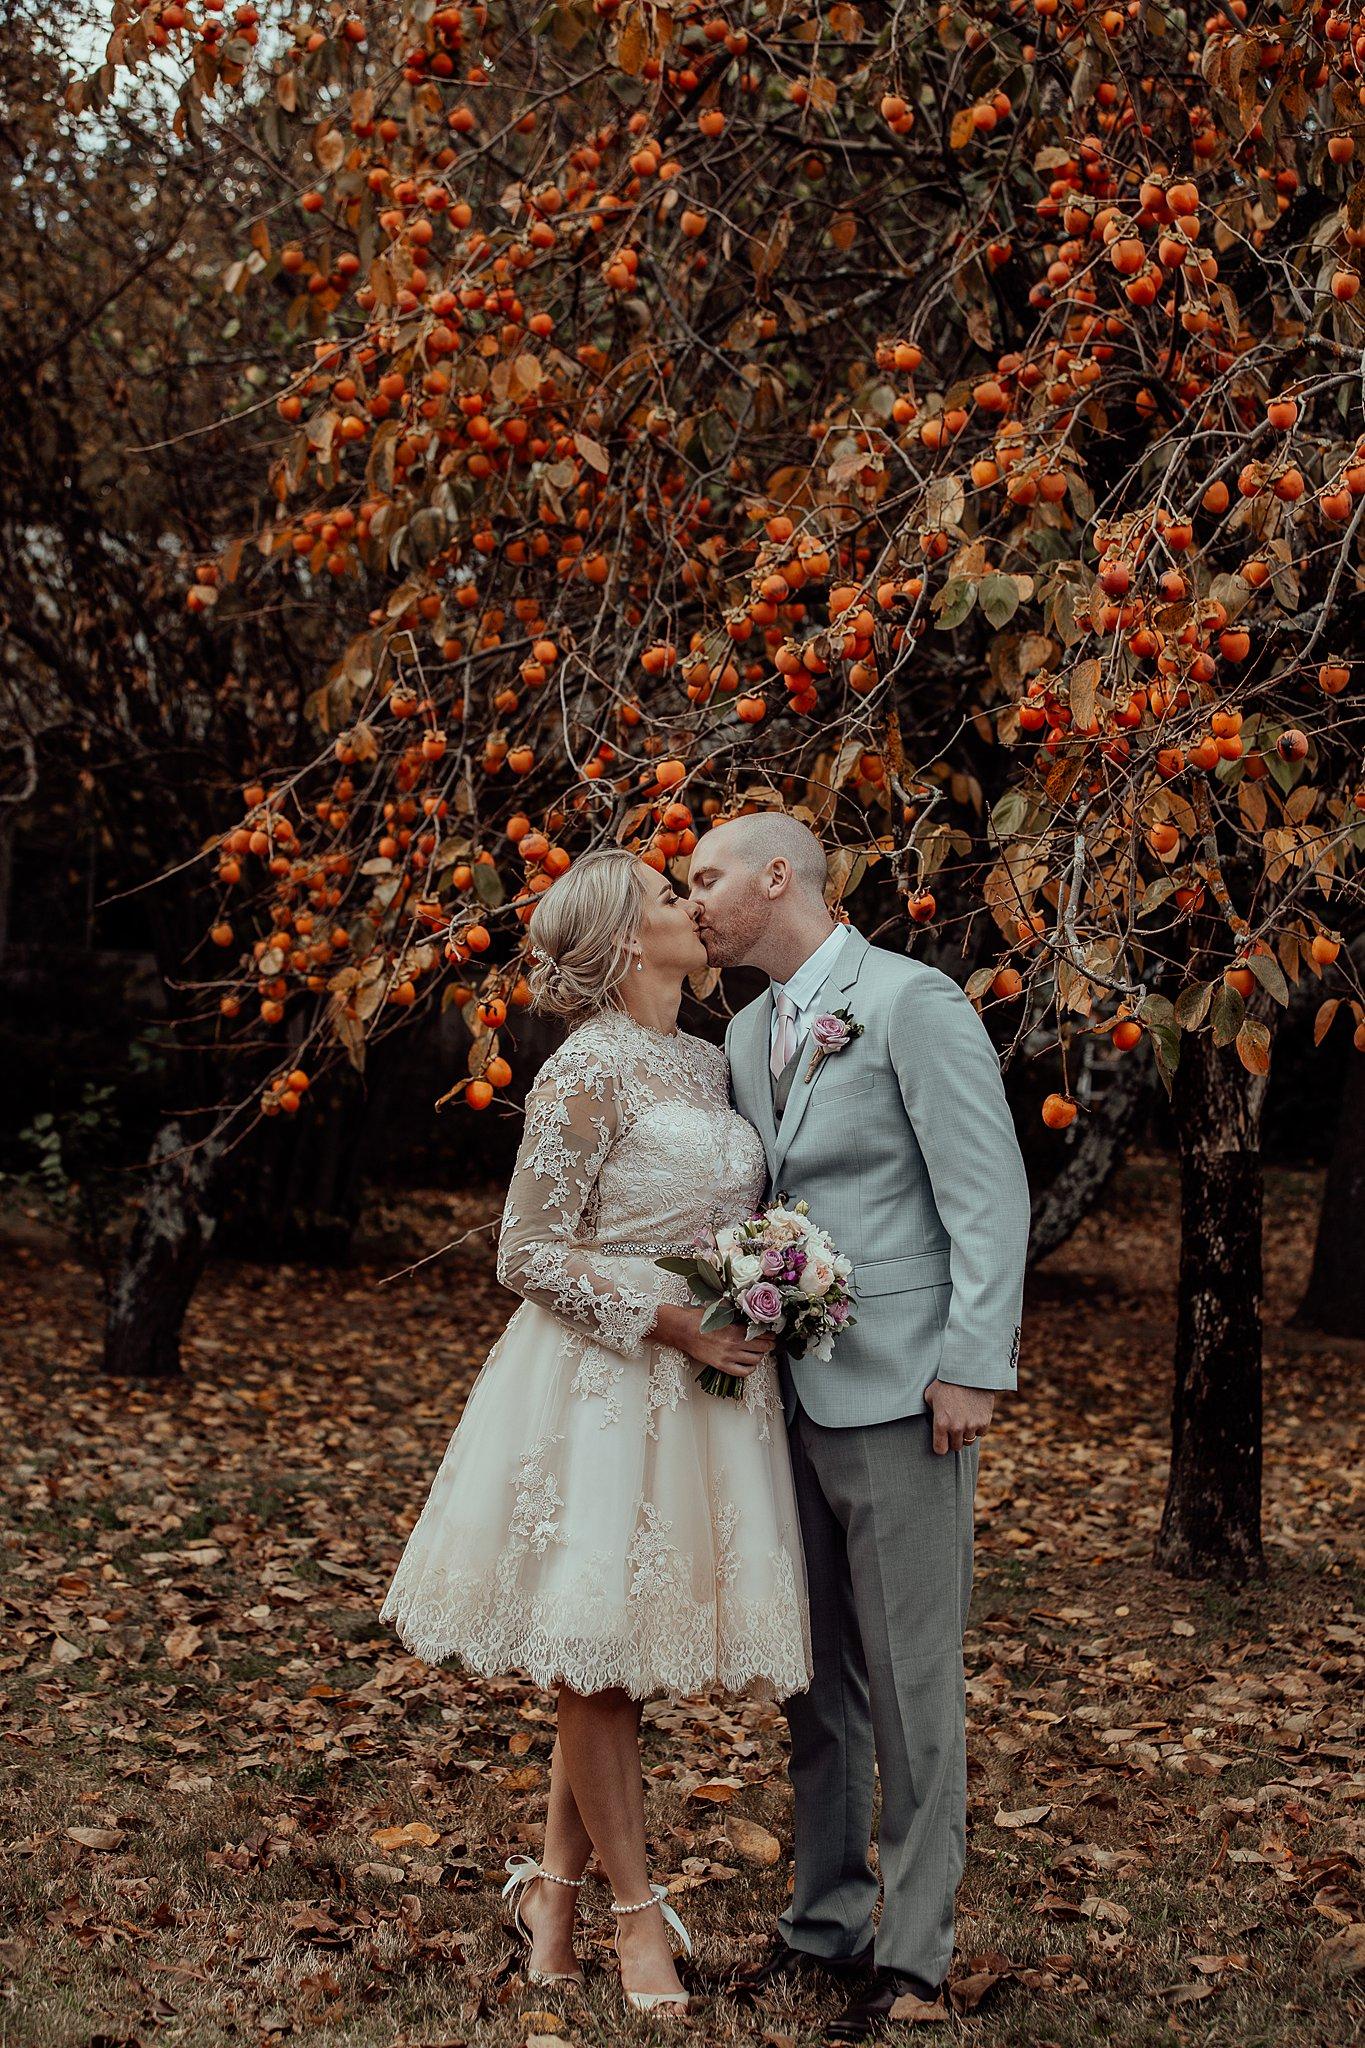 mickalathomas_puremacphotography_weddingphotographer_couplephotographer_Sheppartonphotographer_3446.jpg